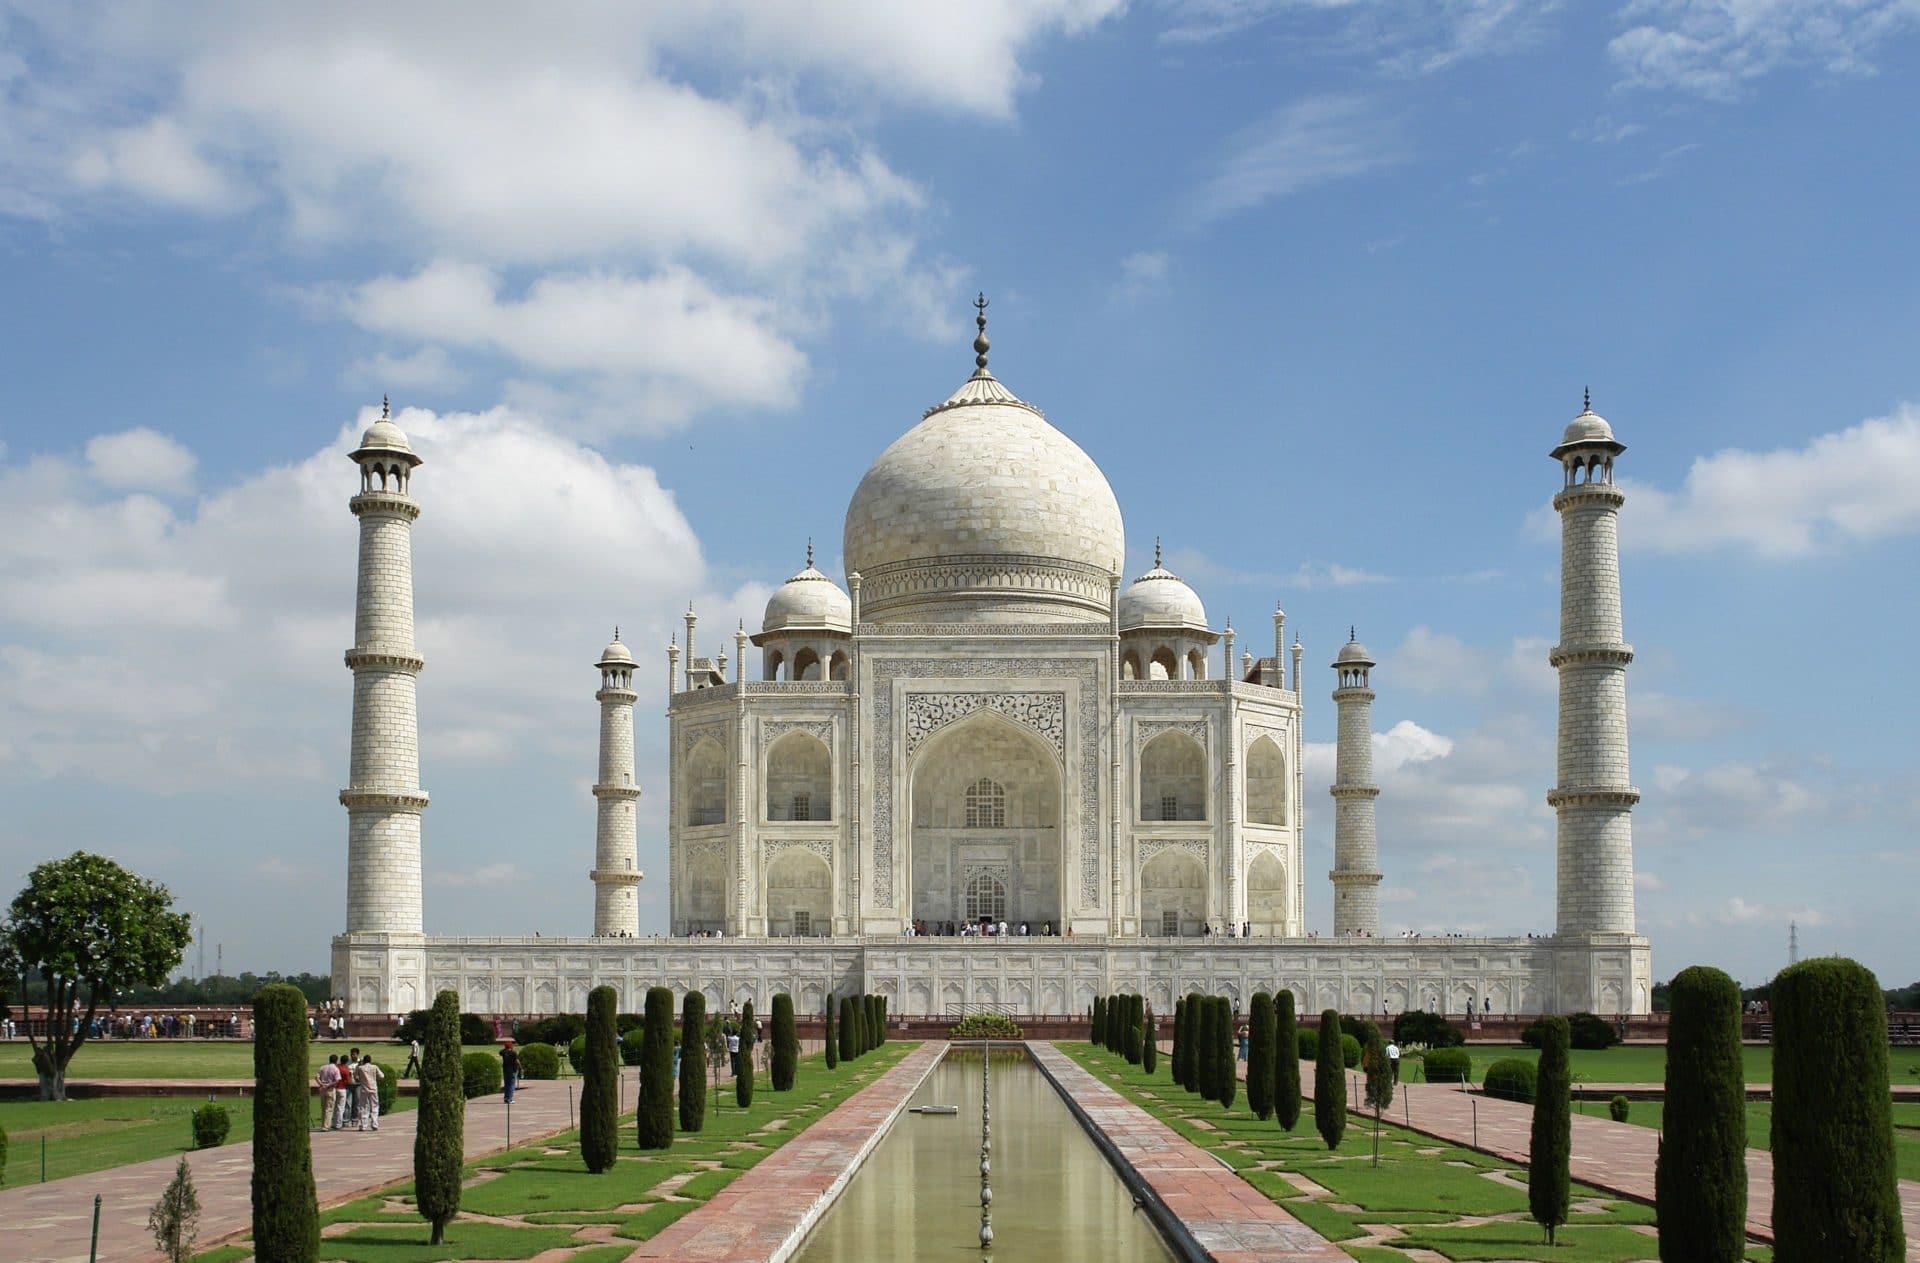 las 7 maravillas del mundo: El Taj Mahal